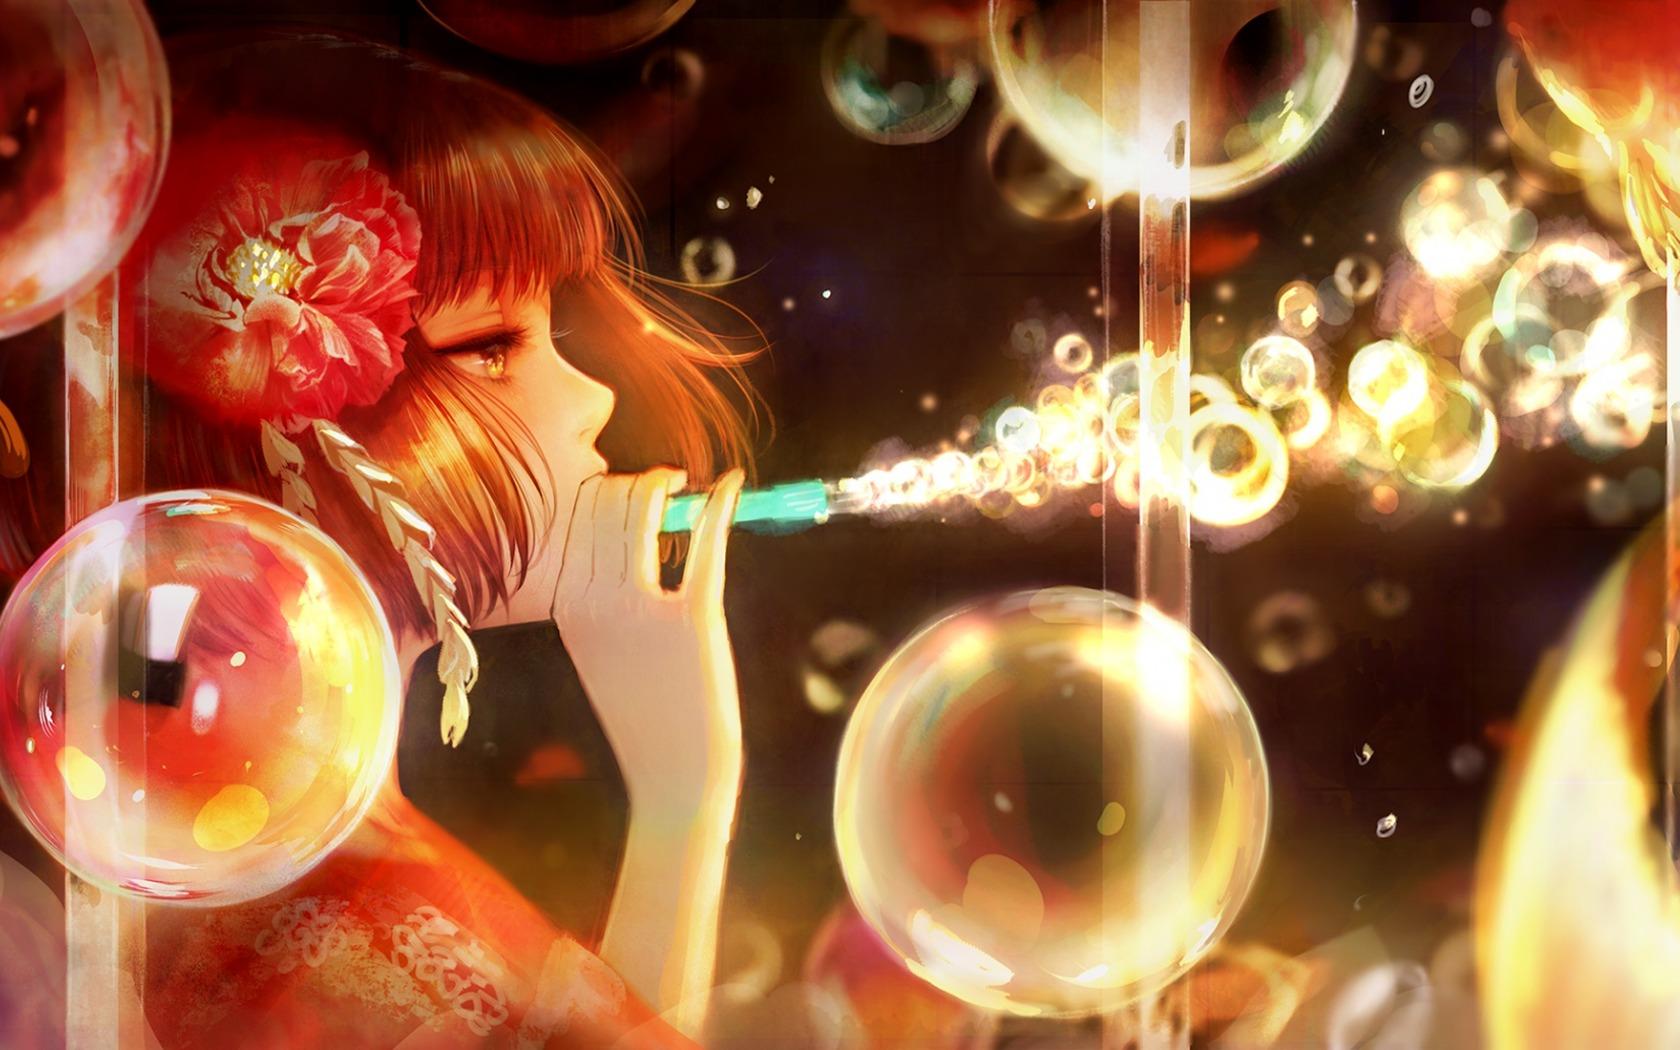 Wallpaper Girl Anime Soap Bubble 1680x1050 4kwallpaper